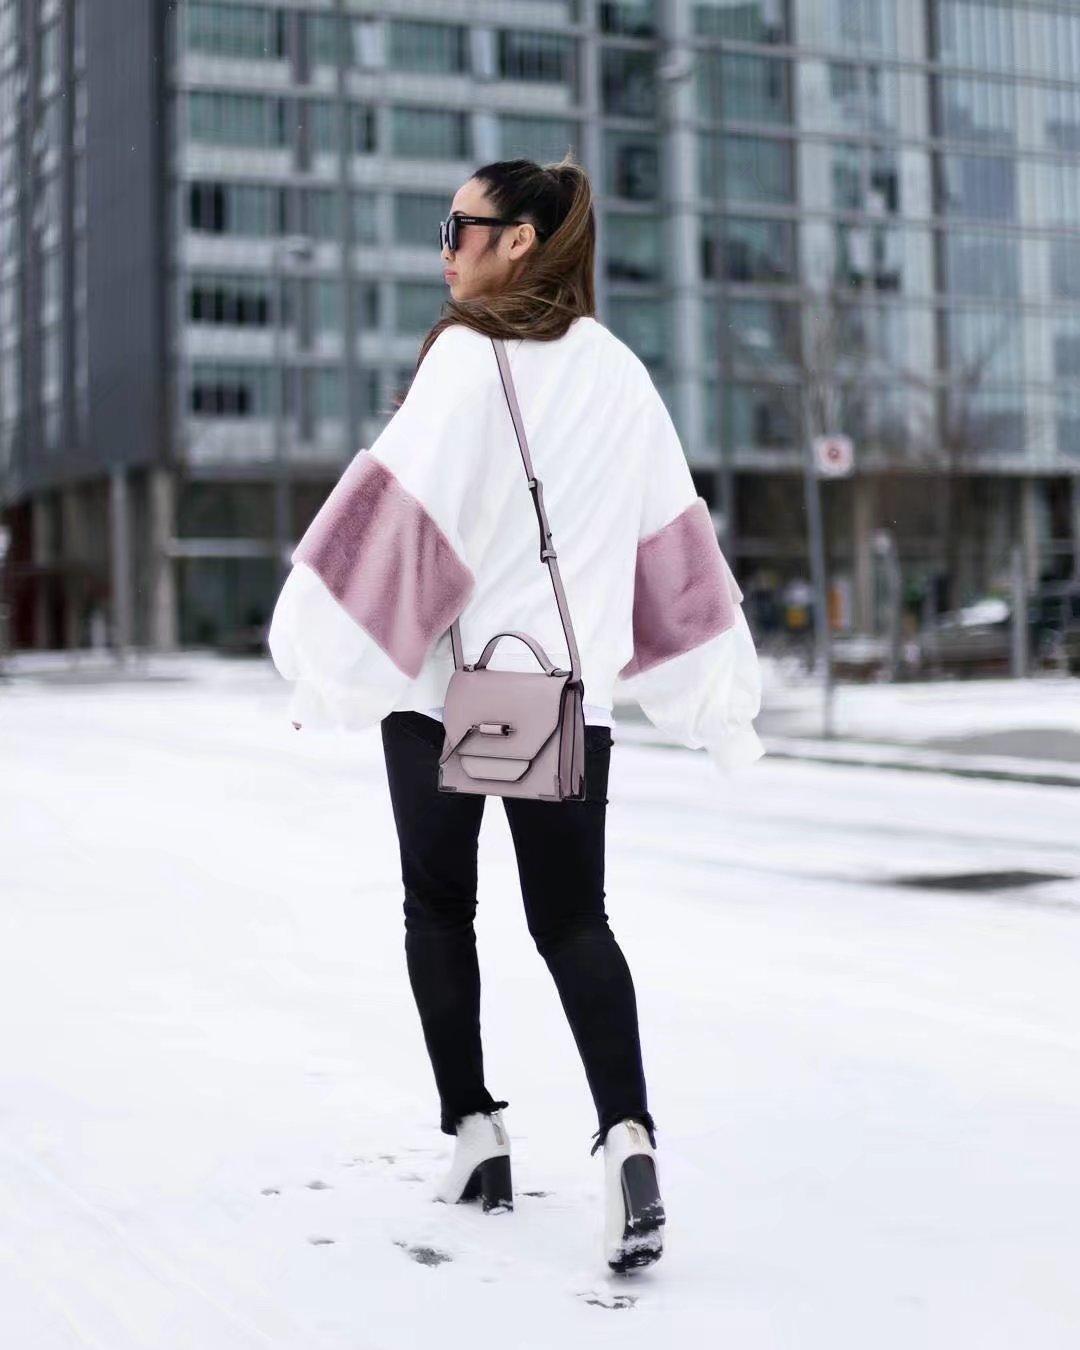 HTB1jJ2USXXXXXaLapXXq6xXFXXXh - FREE SHIPPING Women Faux Fur Crop Hoodies Sweatshirt Tumblr Oversize Pink JKP282